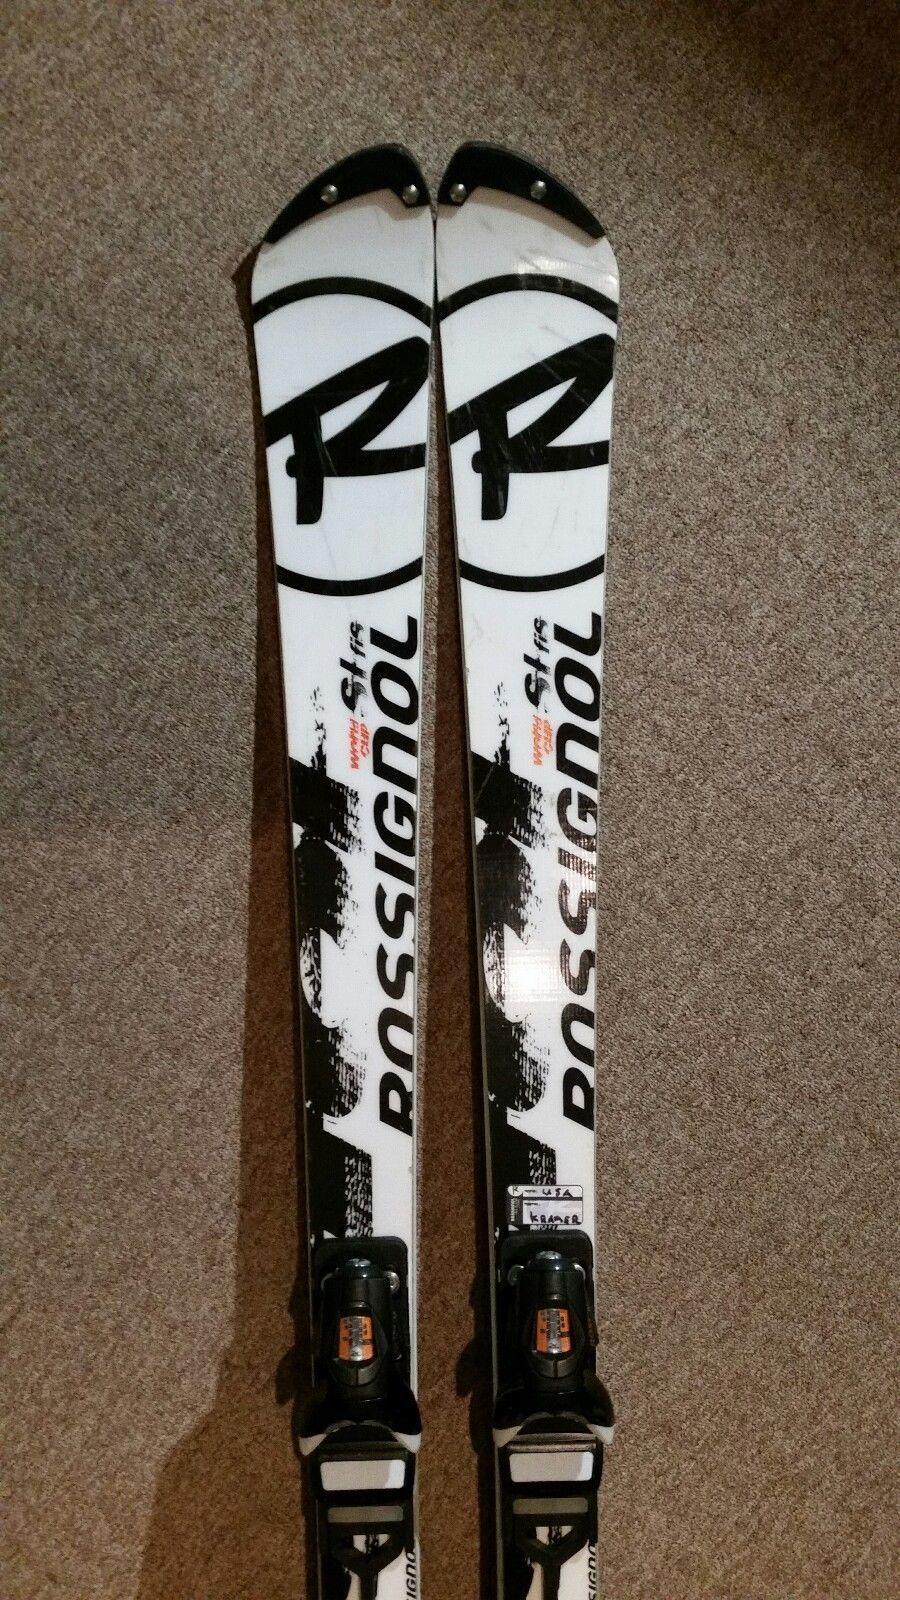 Rossignol World Cup Slalom Skis 165cm Slant Tip With Bindings Slalom Skiing Skiing World Cup